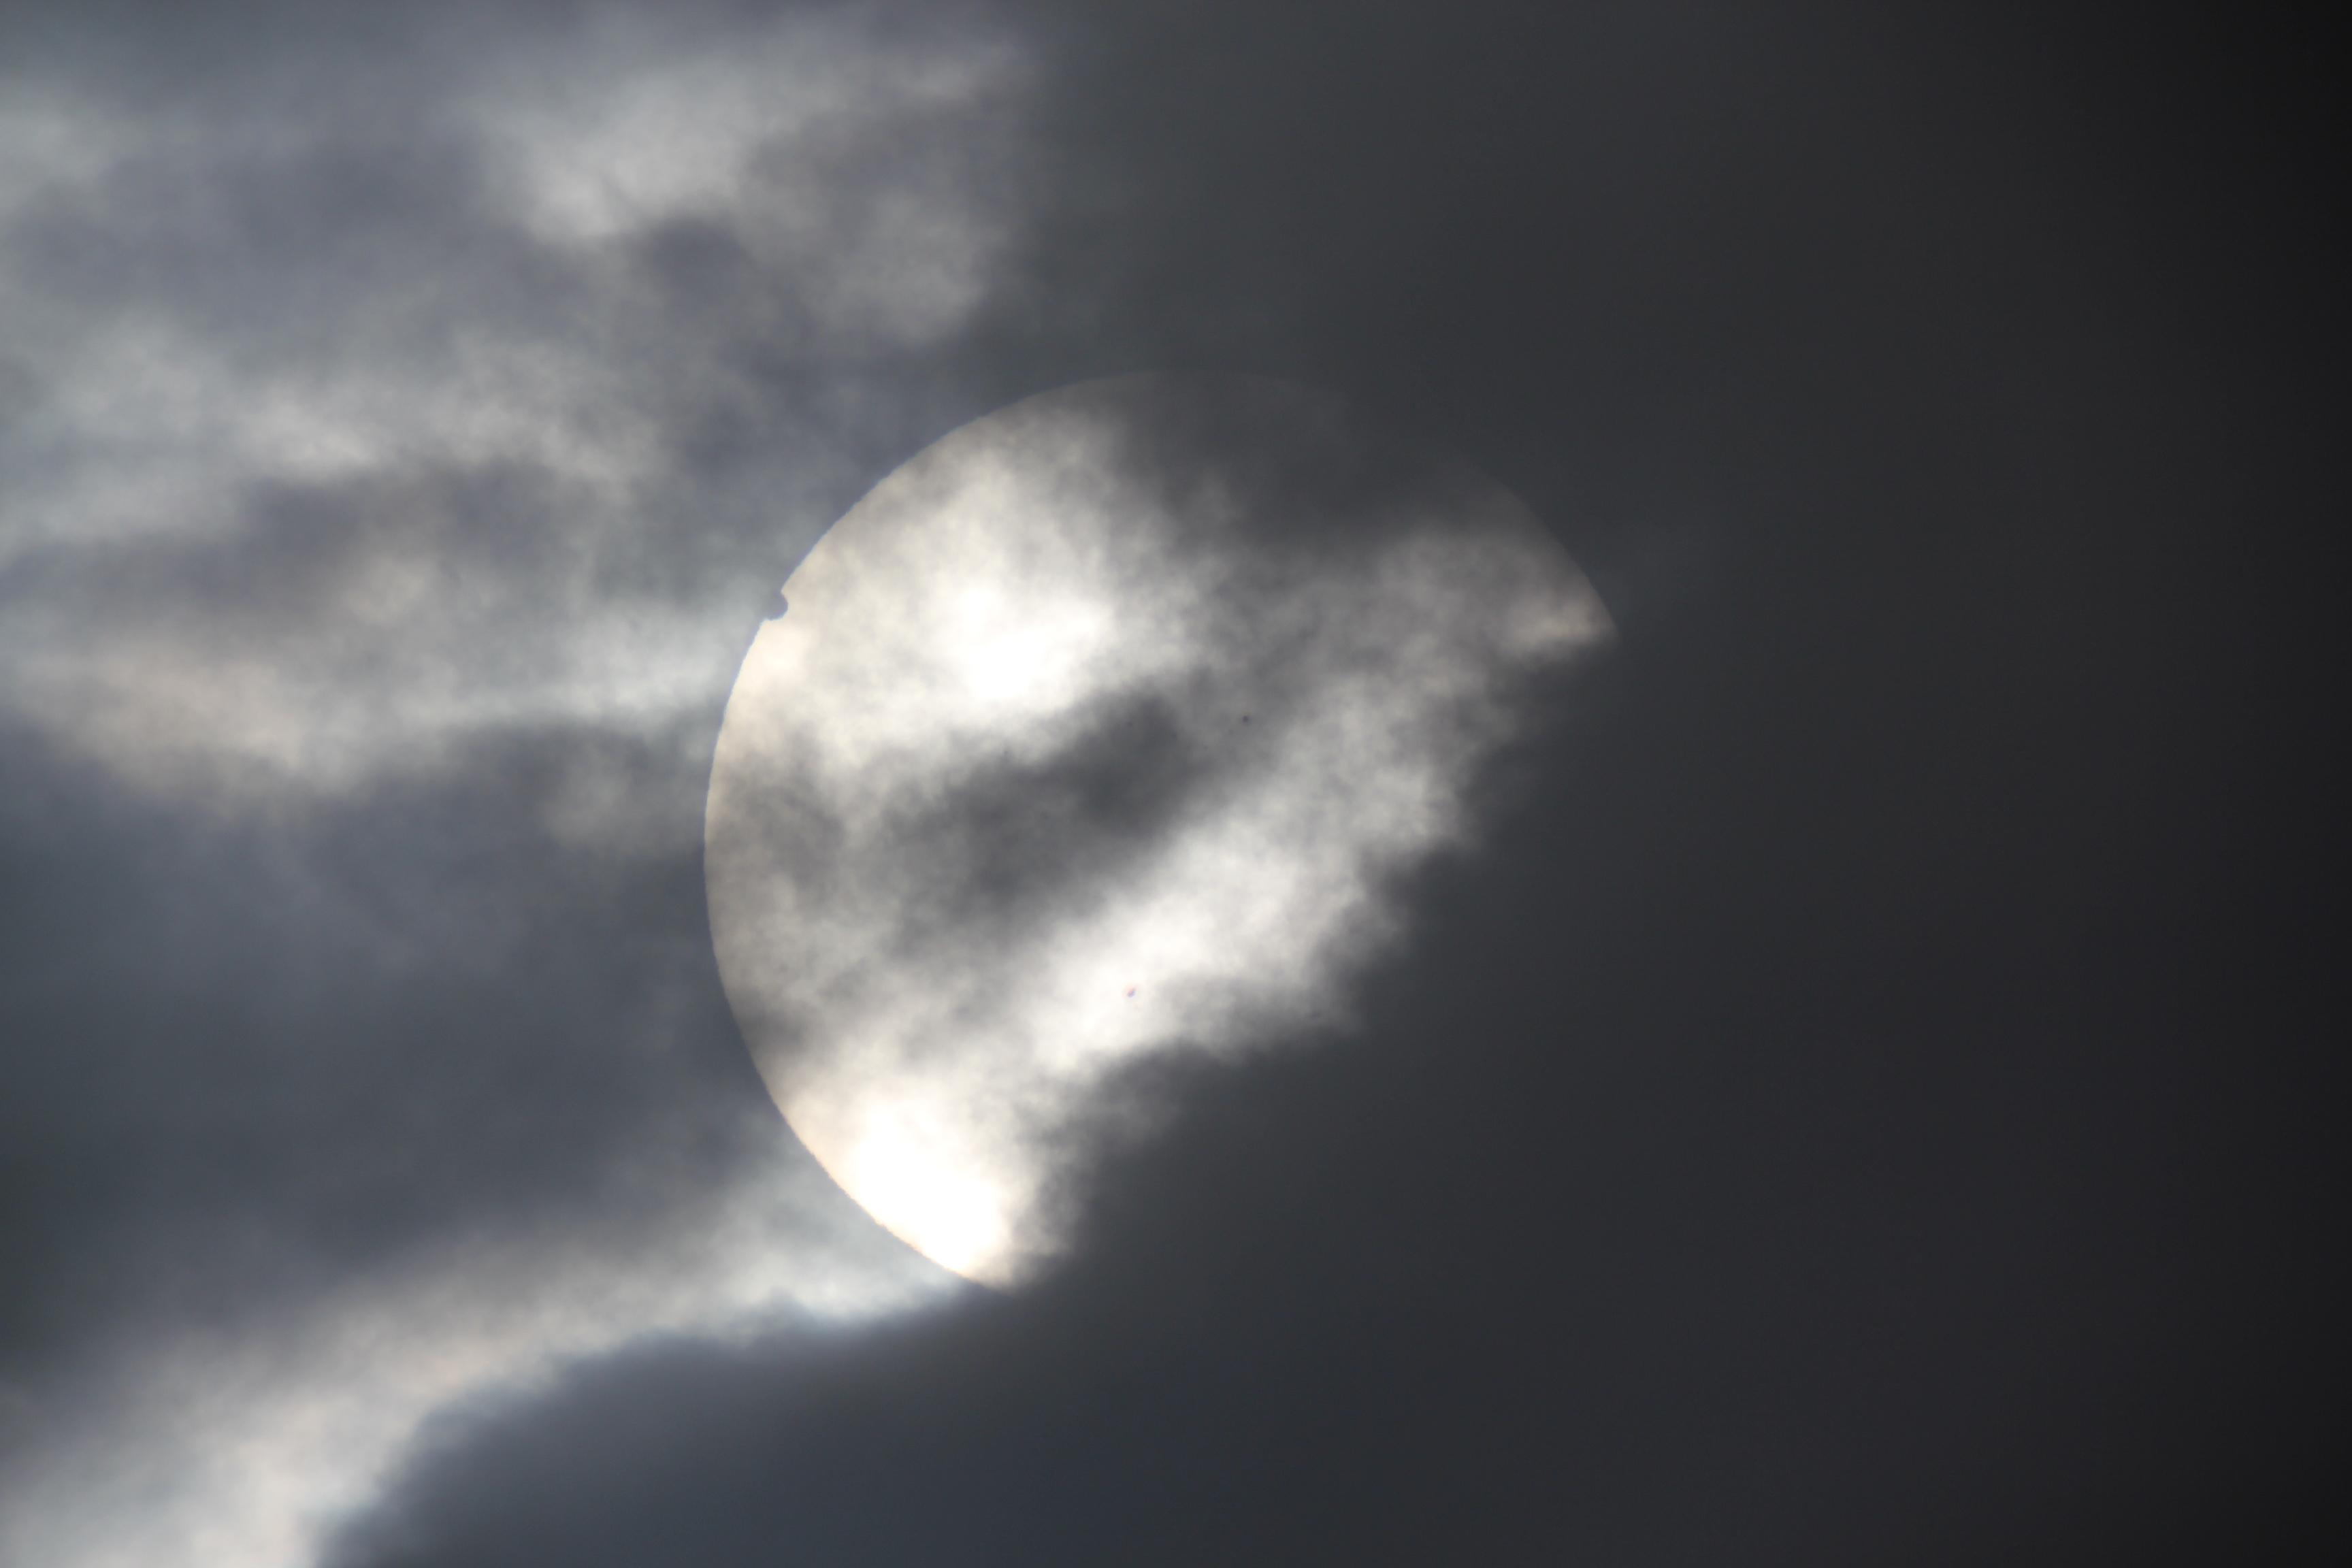 Transit of Venus 2012: Spitsbergen